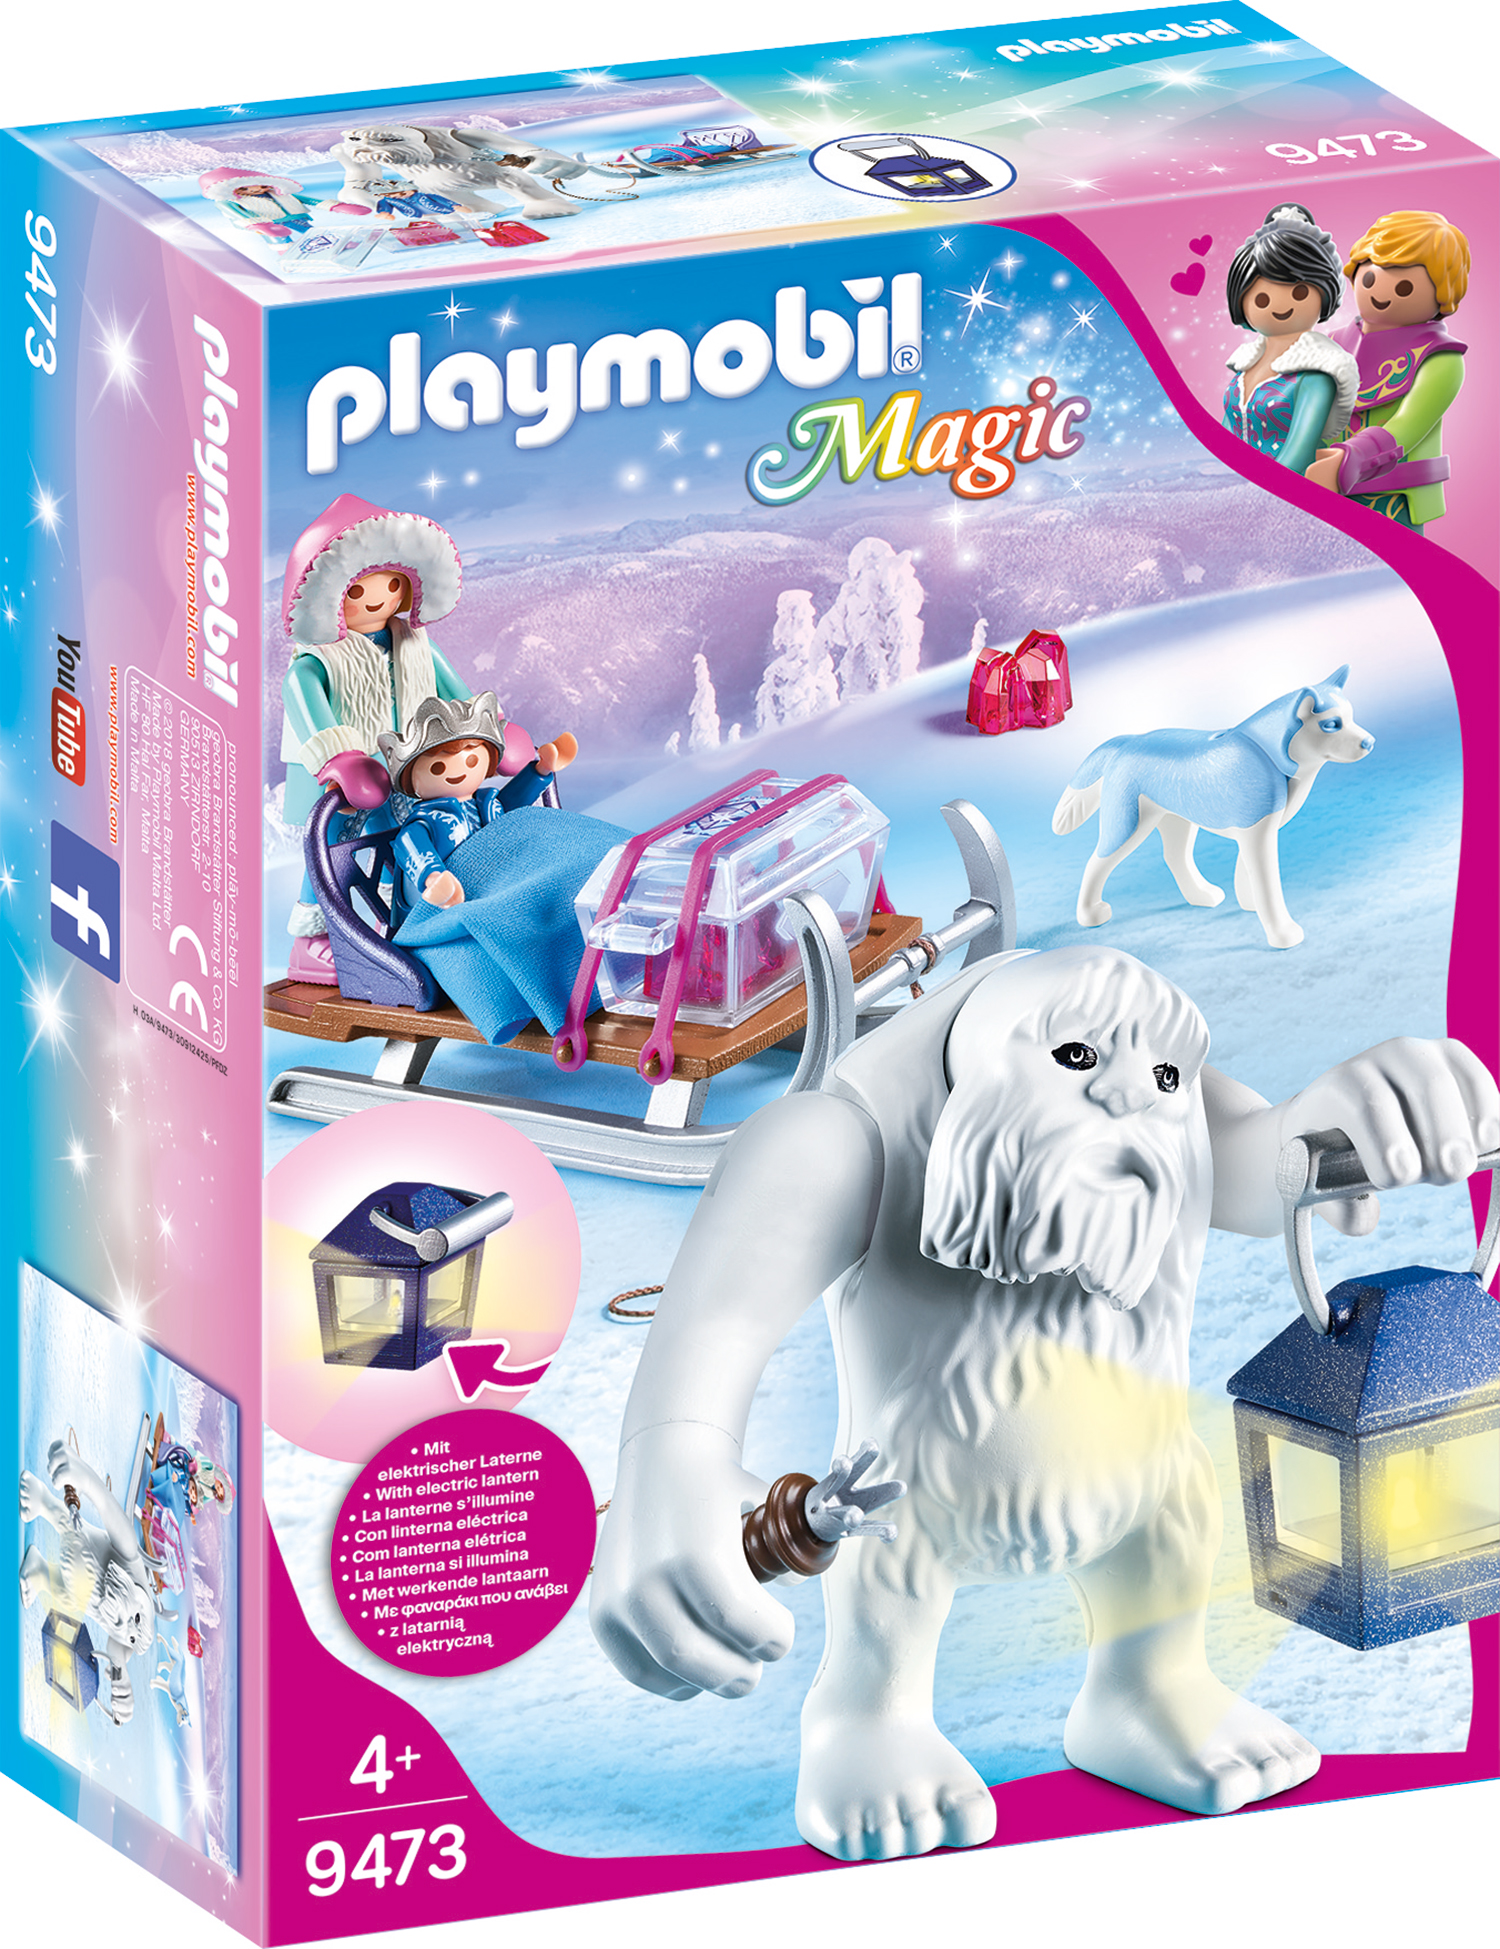 Yeti cu sanie si figurine playmobil magic